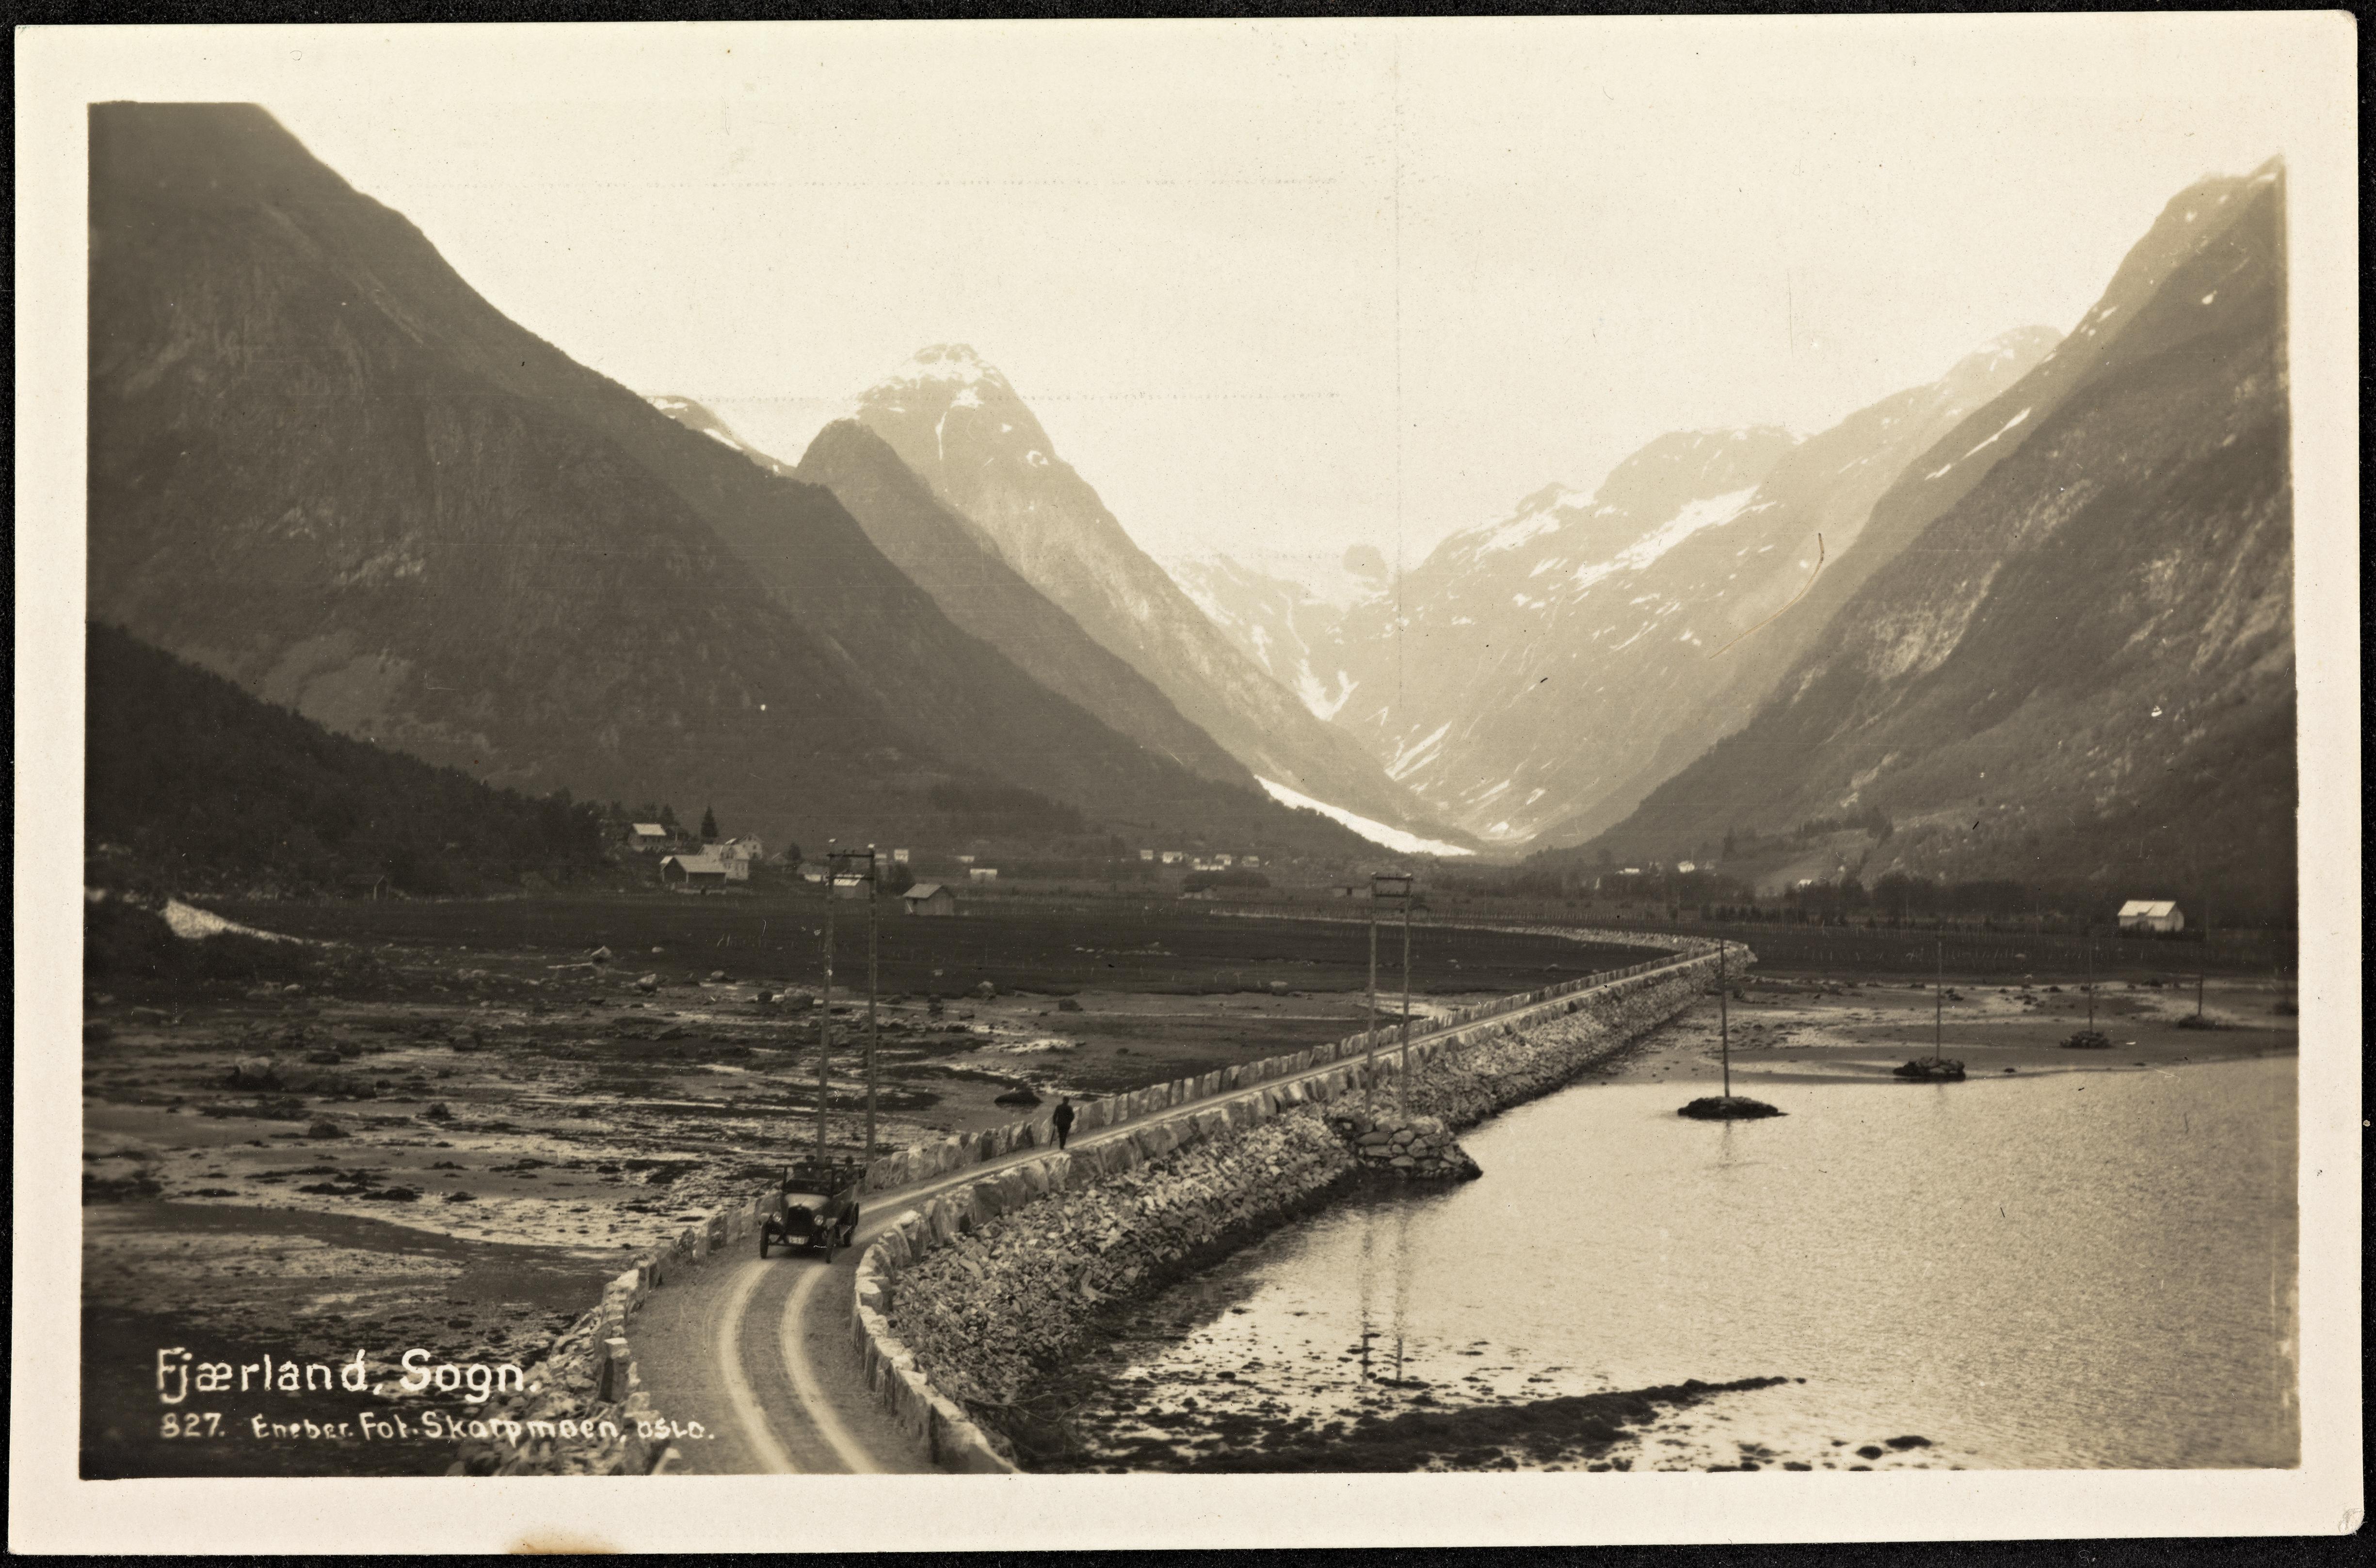 827. Fjærland, Sogn